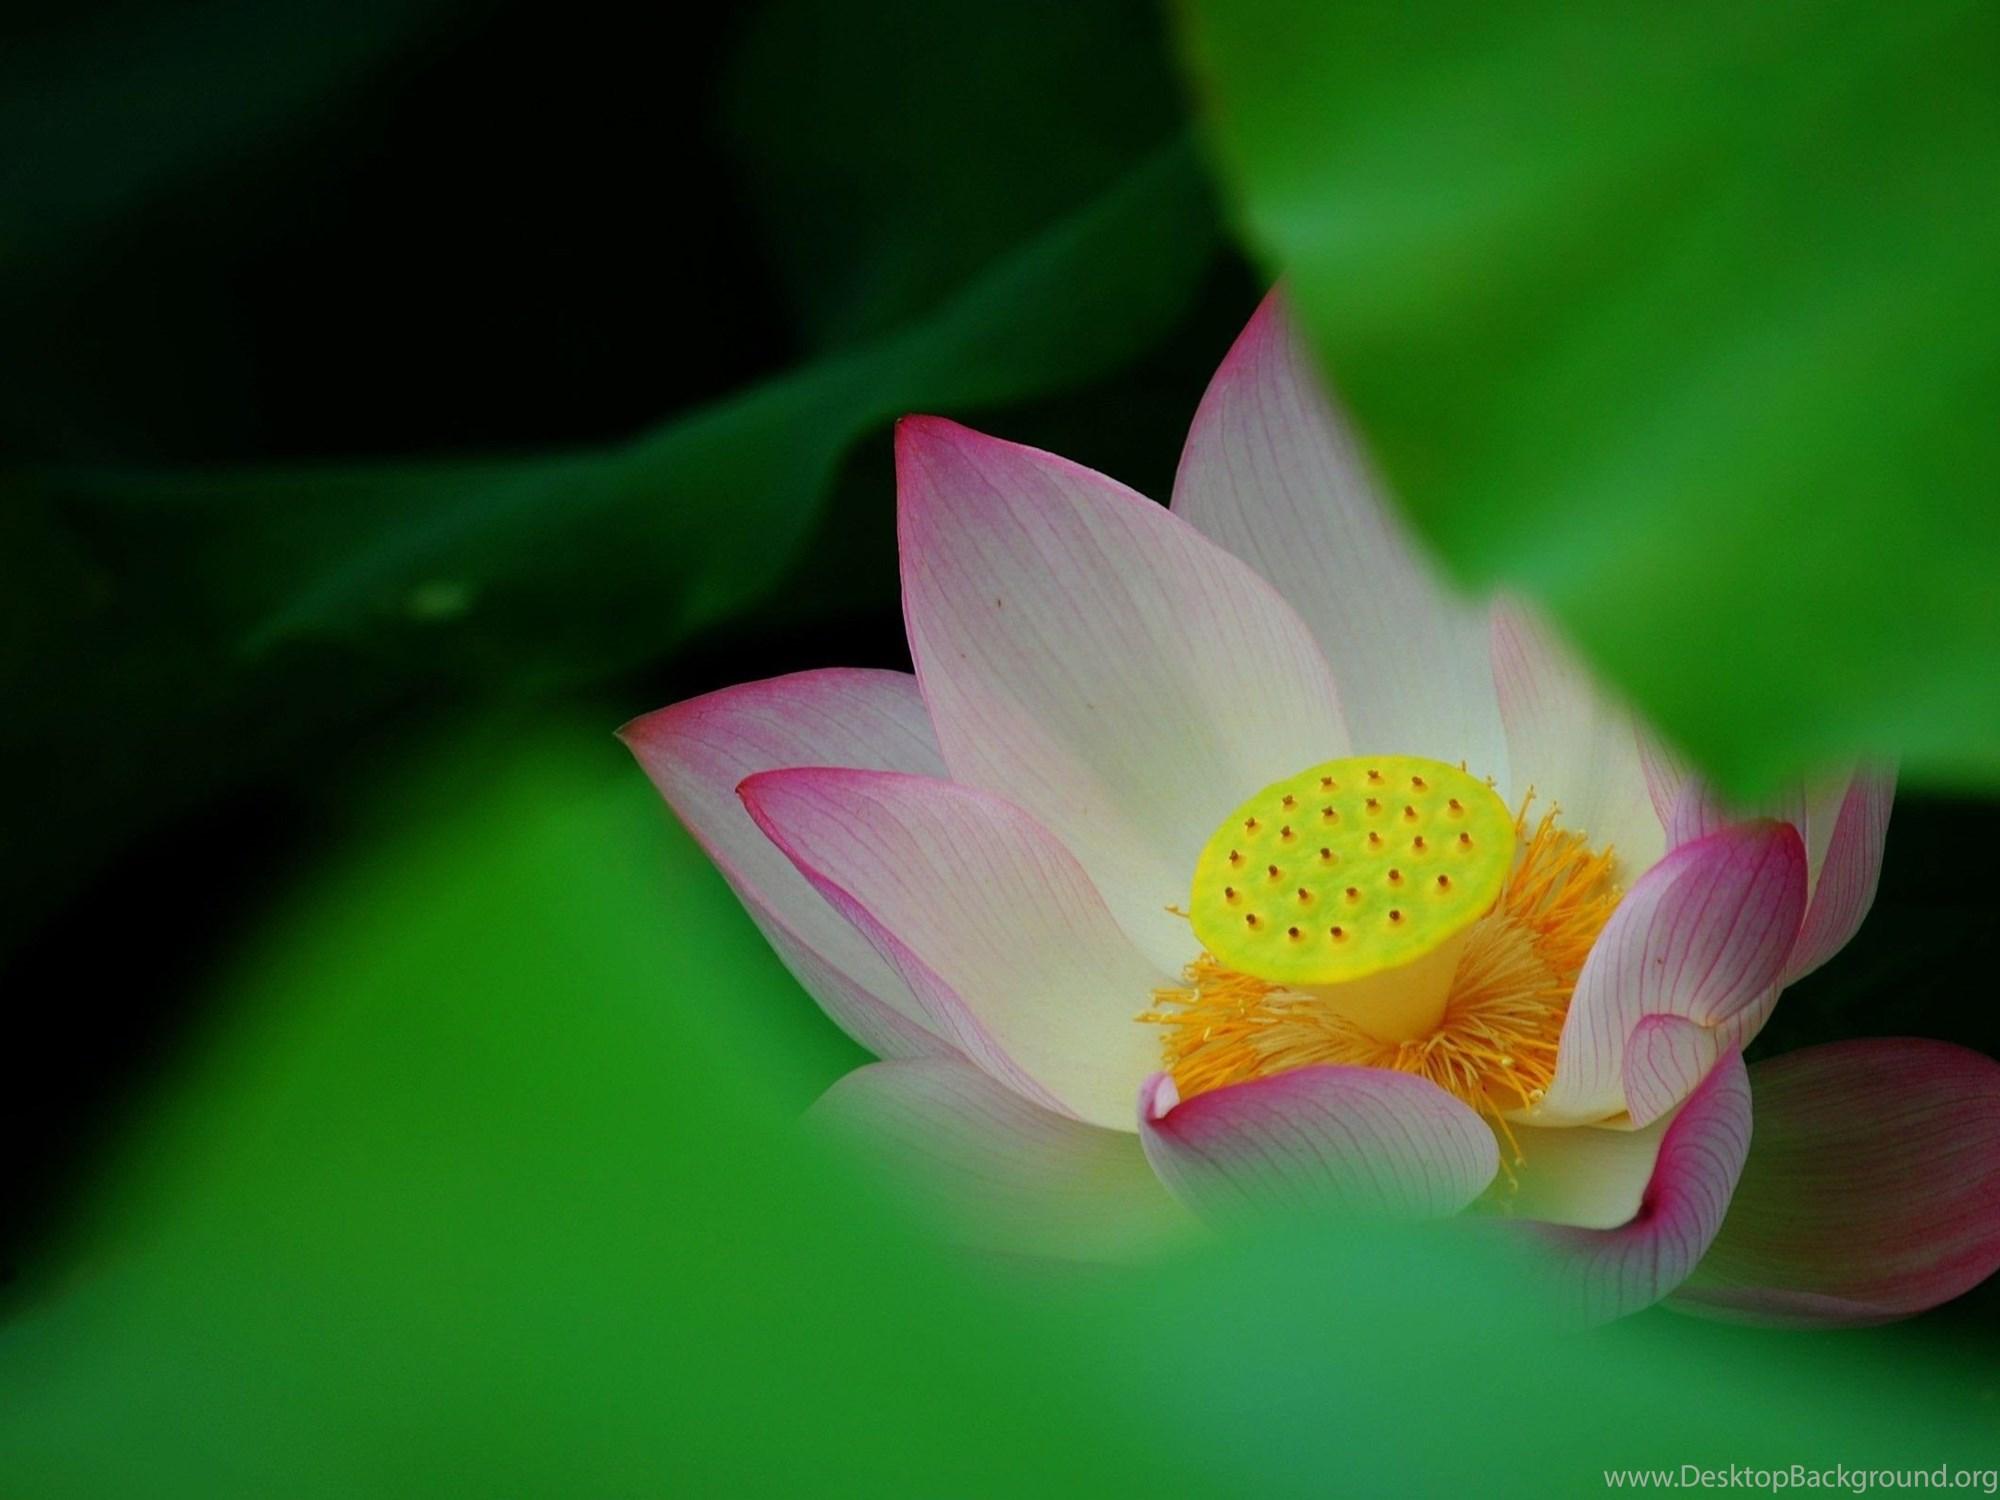 Lotus Flower Desktop Wallpapers Toptenpack Desktop Background